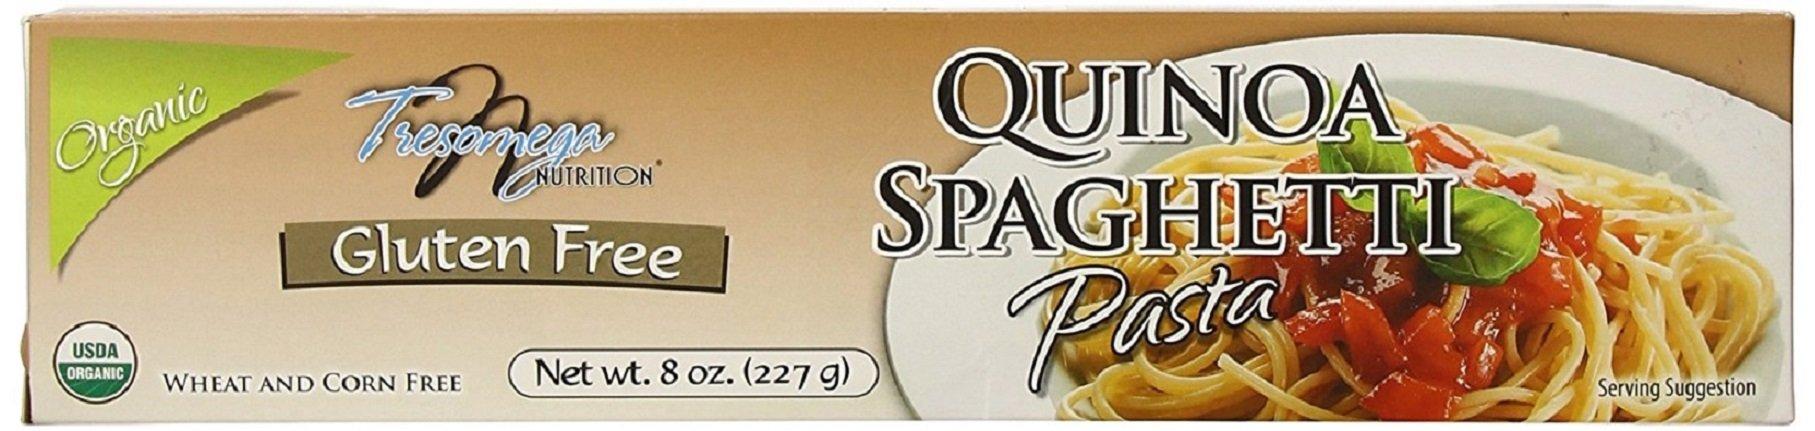 TresOmega Nutrition– Organic Quinoa Spaghetti Pasta–Made with Organic Quinoa, Rice & Amaranth for A Meal High in Protein & Fiber–8 oz. Box